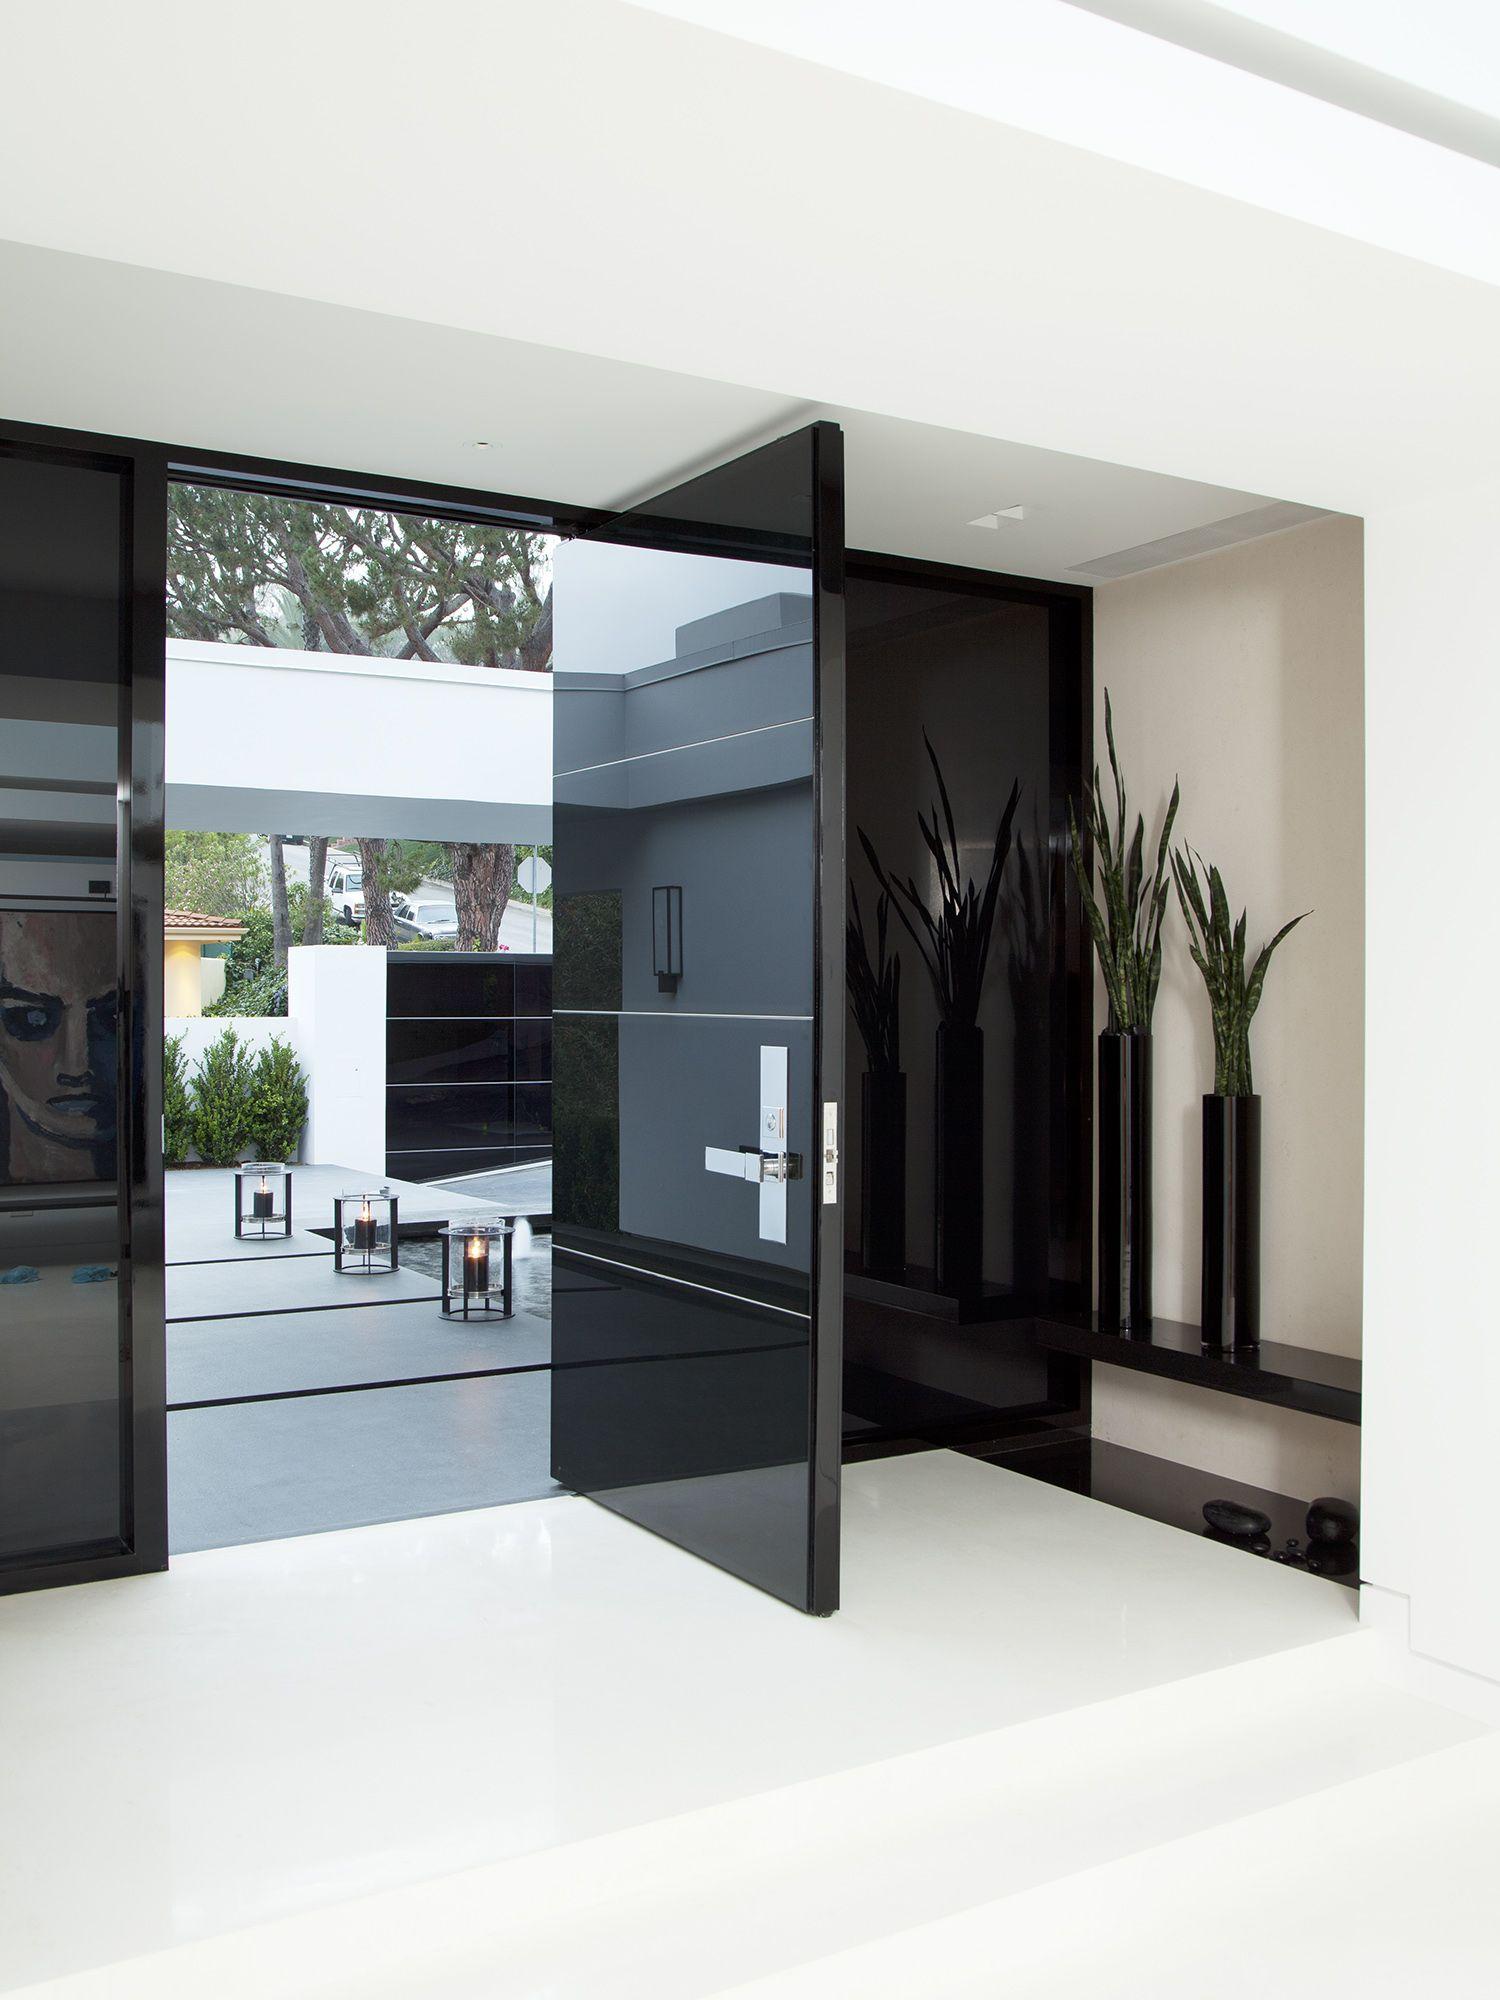 Entradas casas puertas negras entradas de casas y for Puertas de entrada de casas modernas